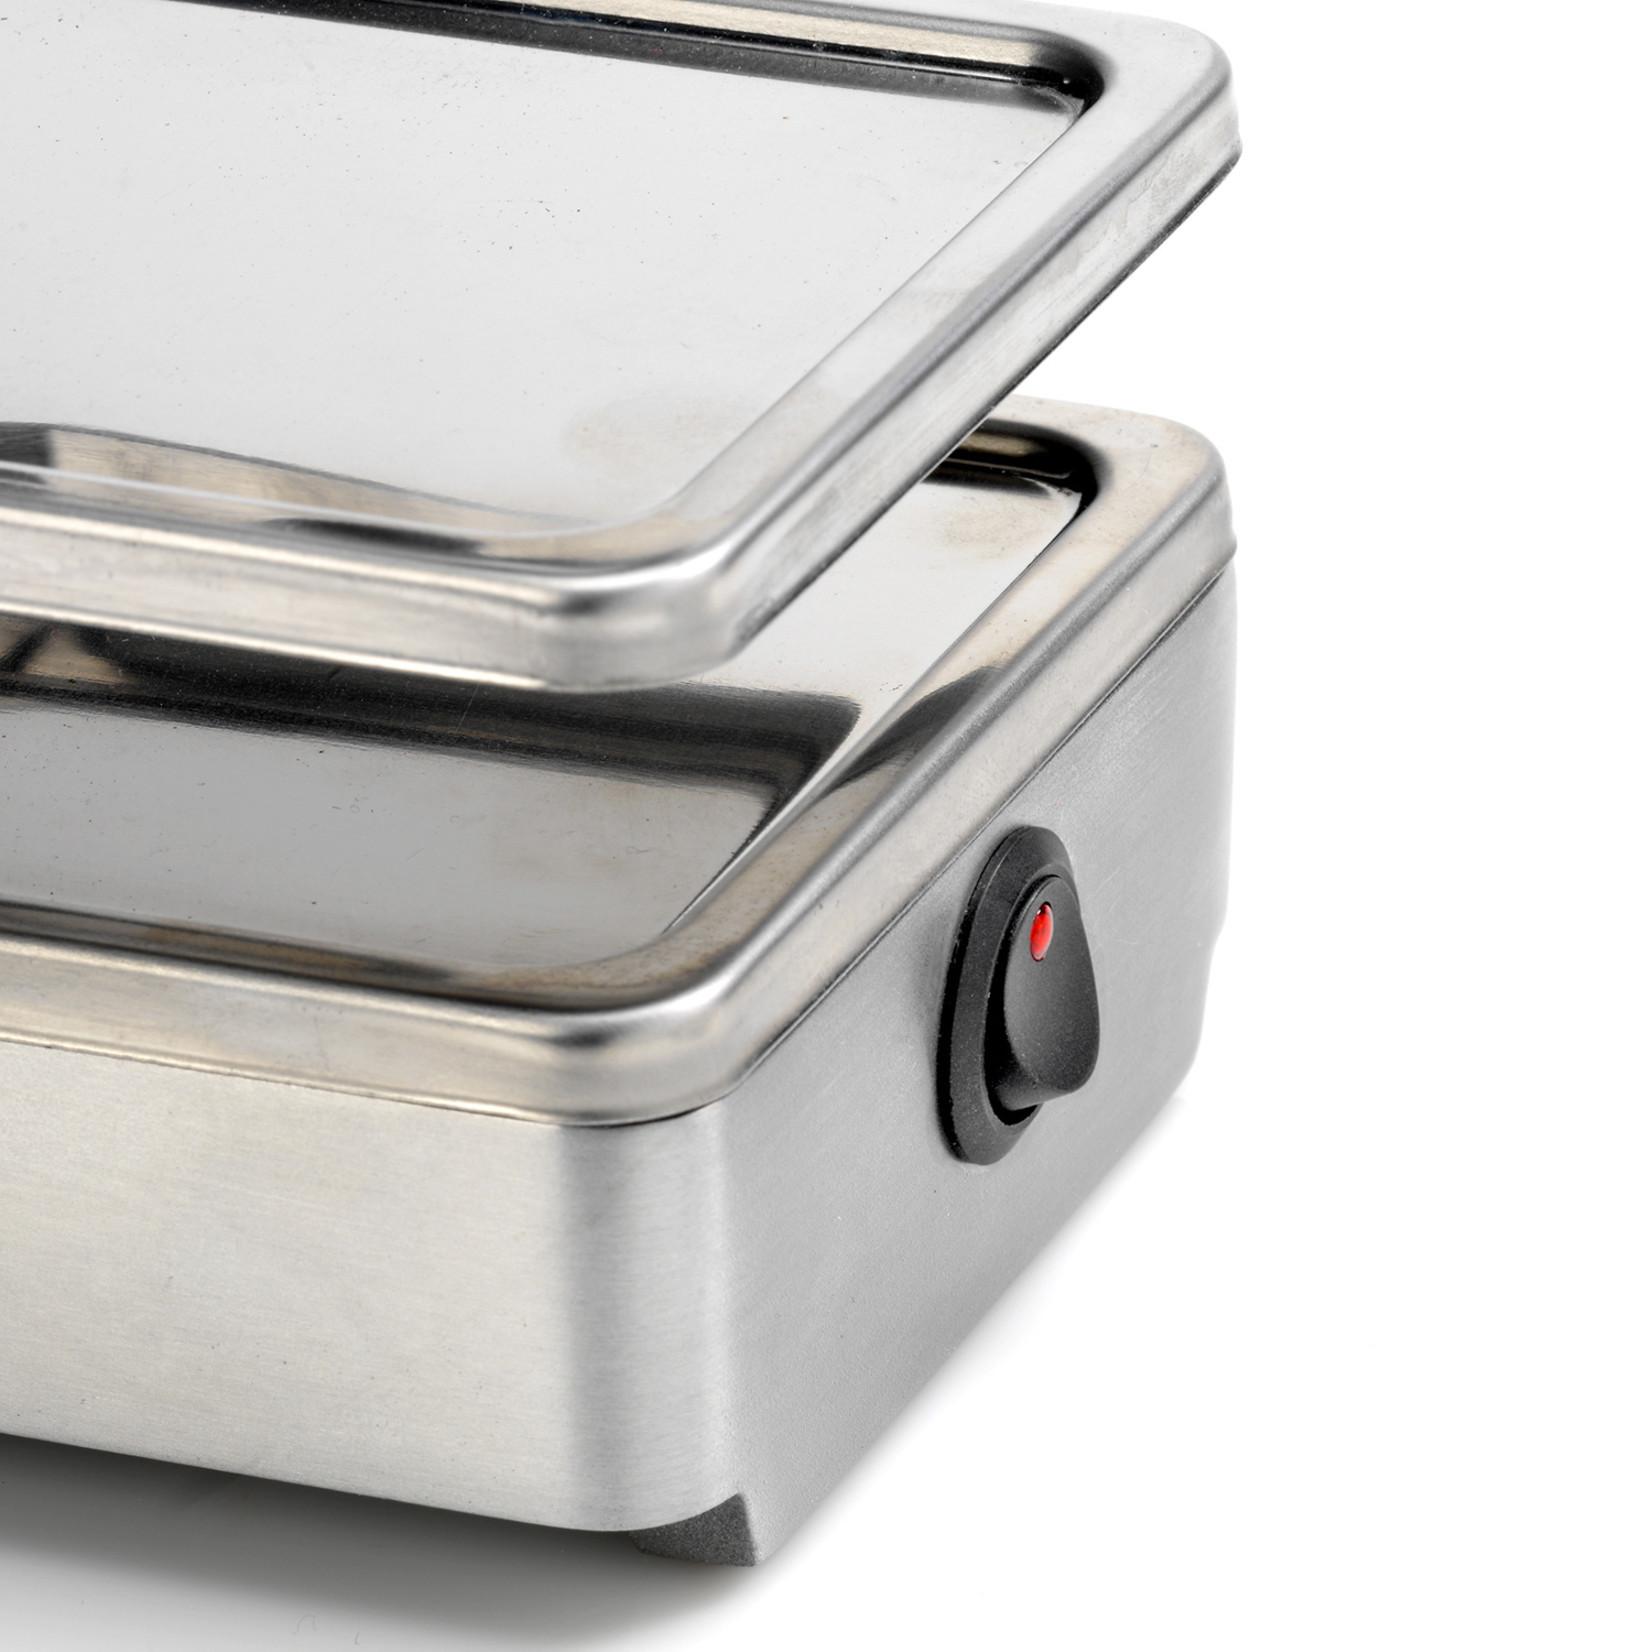 Espressions Espressions Gourmetstel Raclette Grill Slim 4-personen